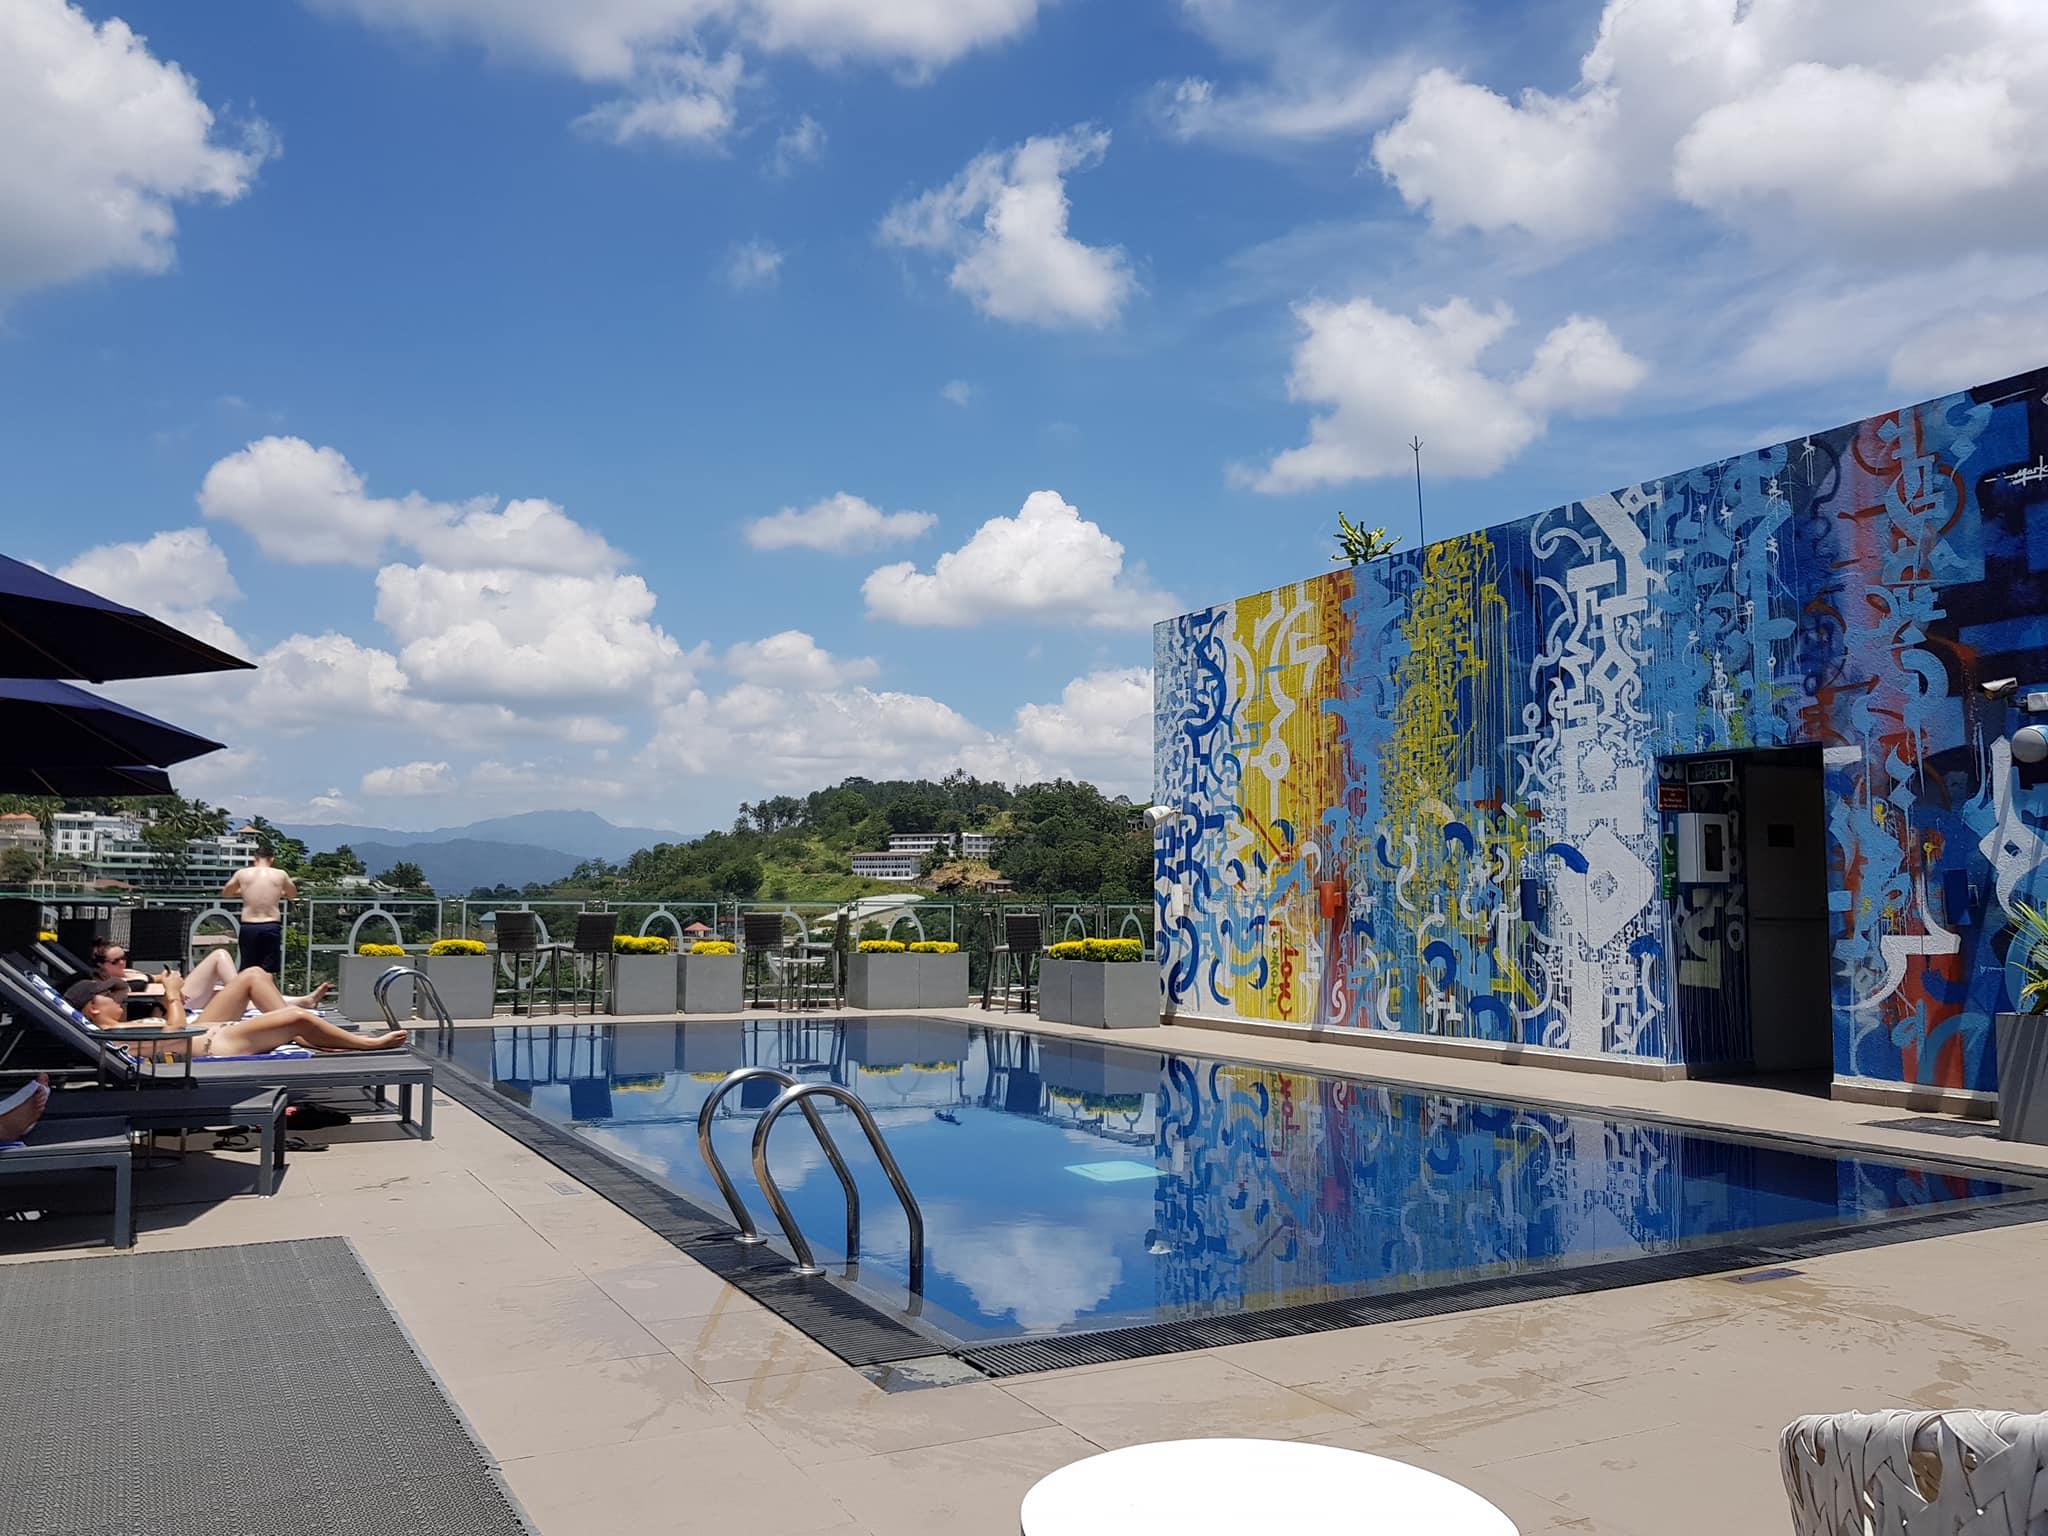 invite-to-paradise-sri-lanka-maldives-holiday-honeymoon-specialists-customer-guest-feedback-zane-lisa-butcher-kandy-ozo-hotel-pool-rooftop.jpg